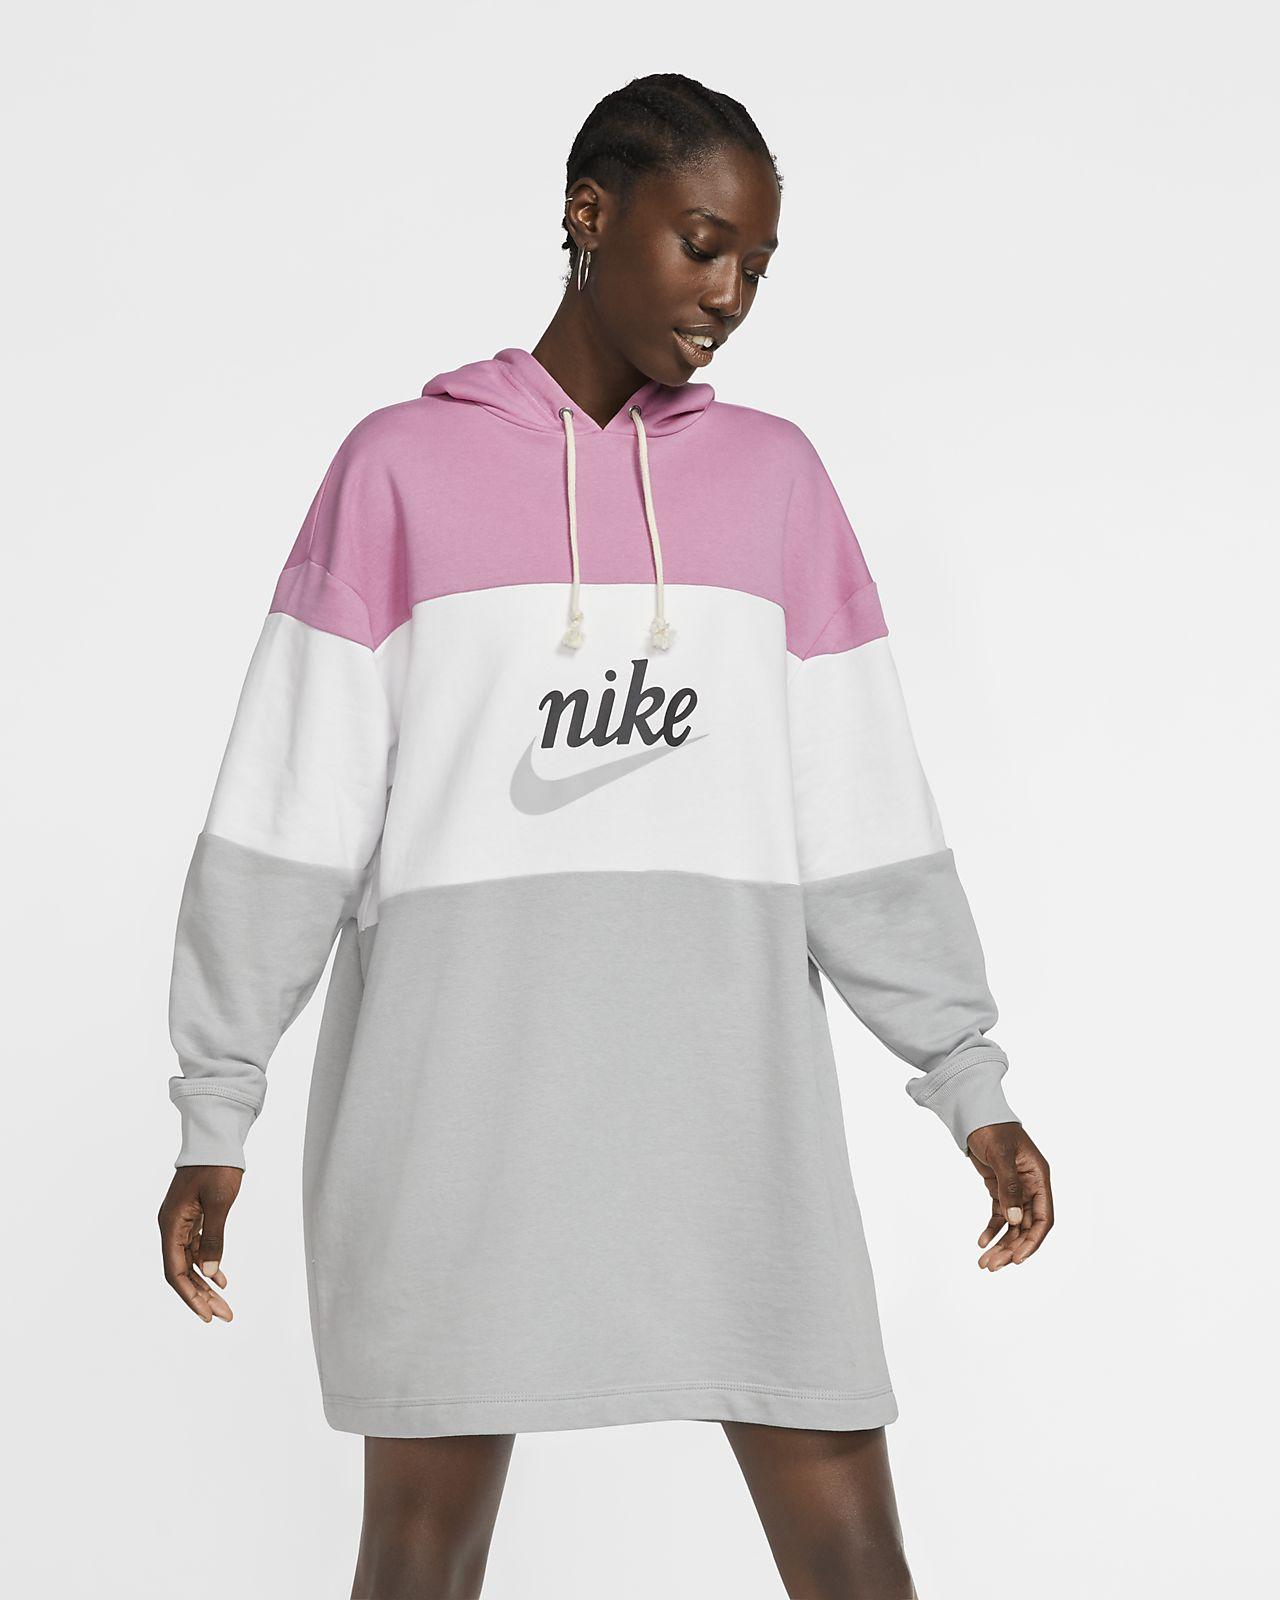 Nike Sportswear Women's French Terry Dress